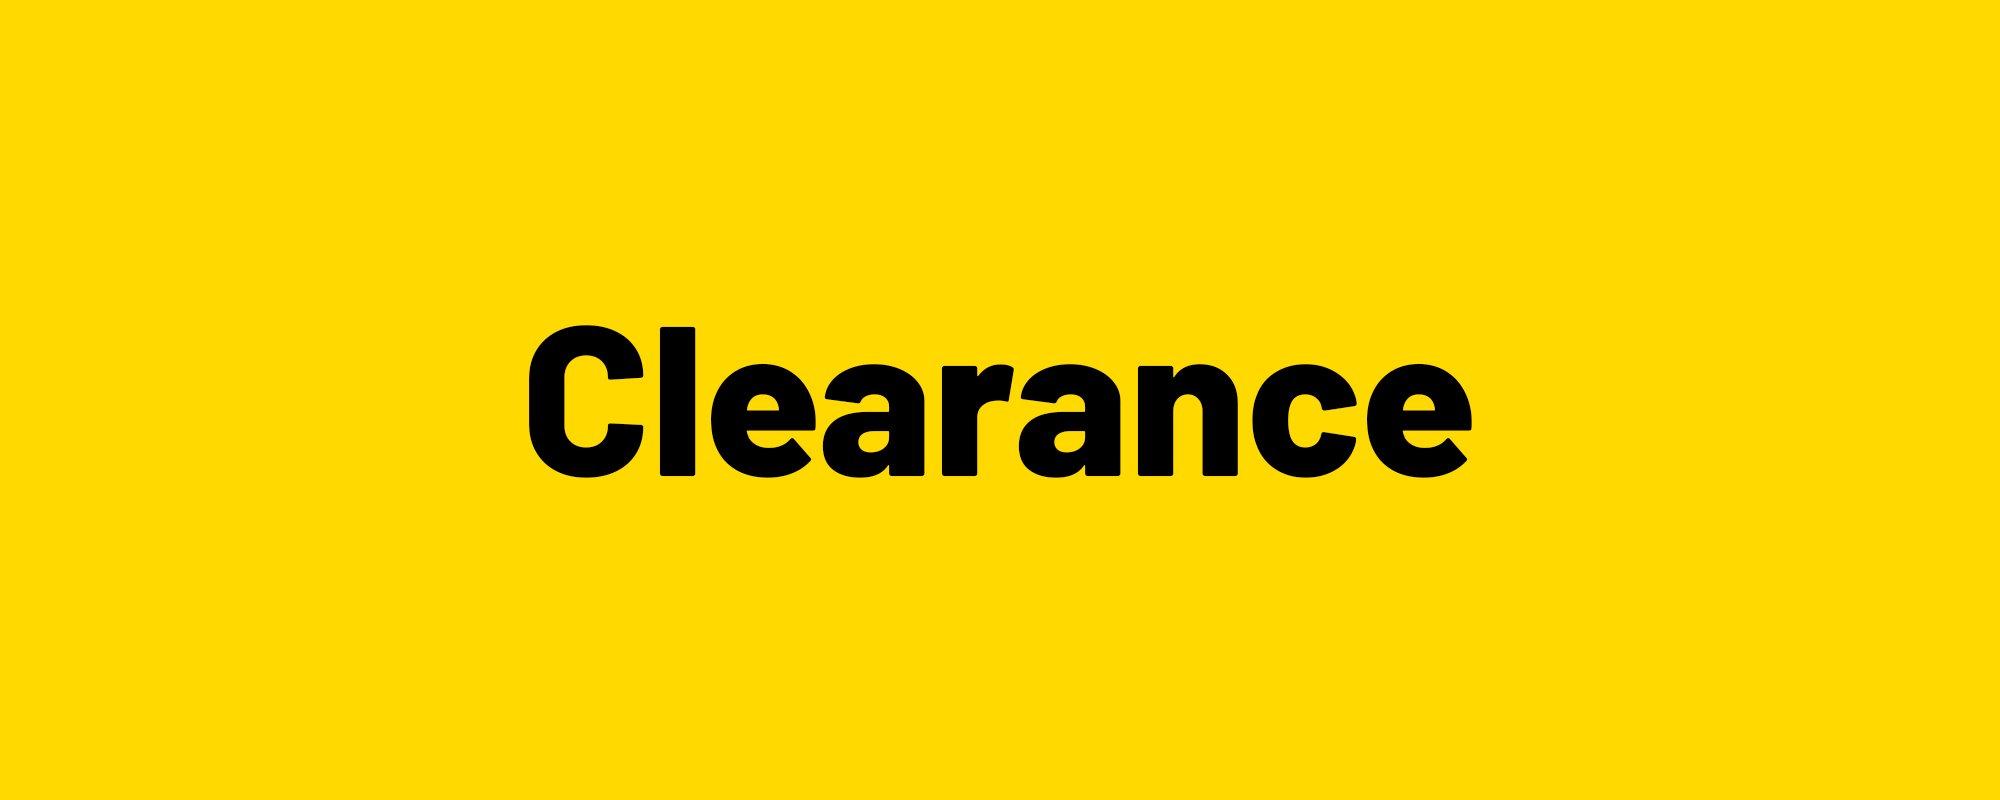 Clearance.